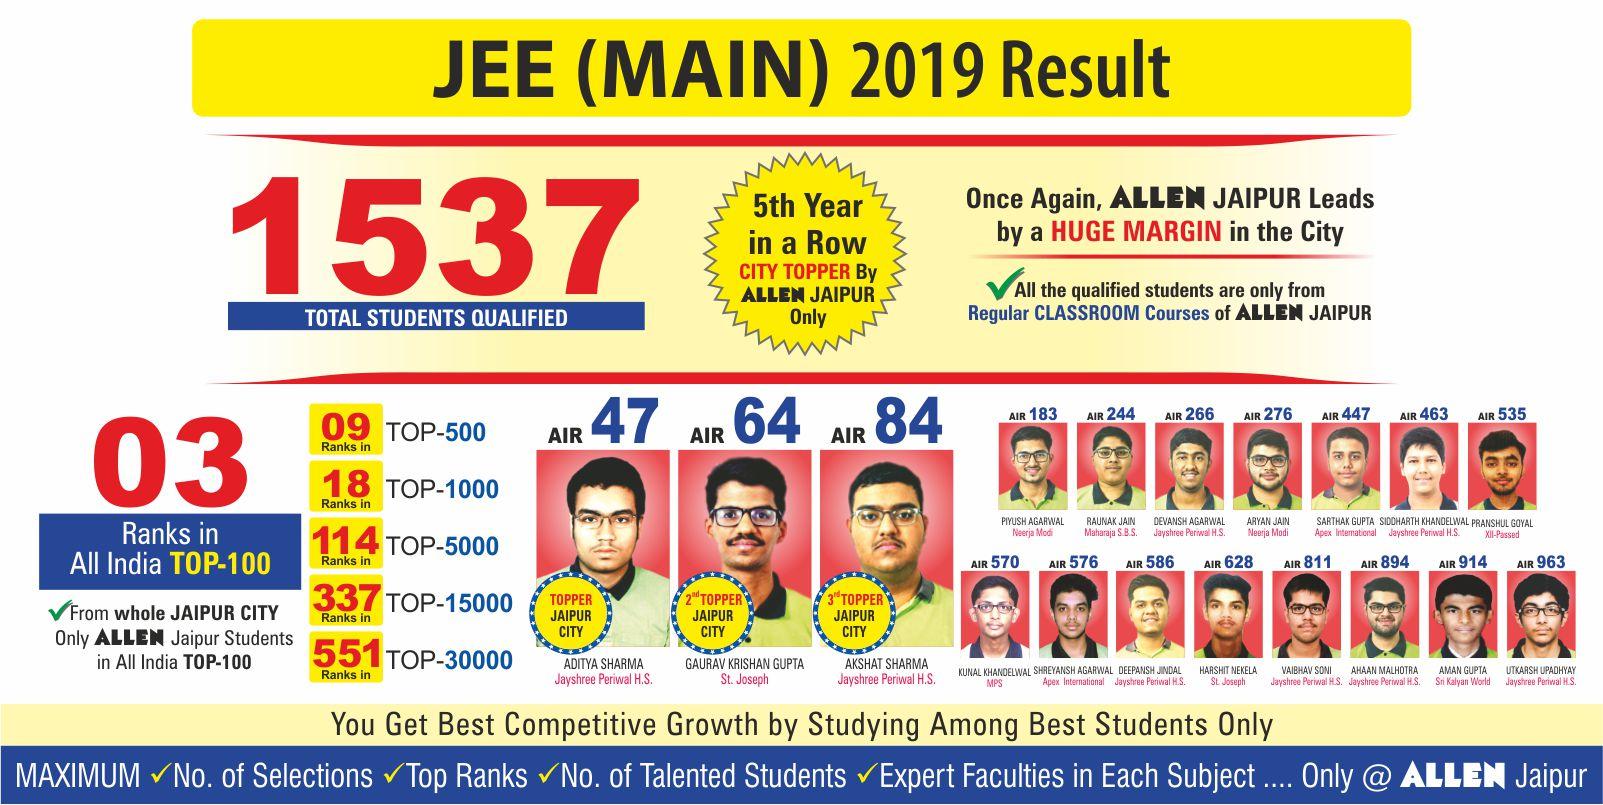 JEE (MAIN) 2019